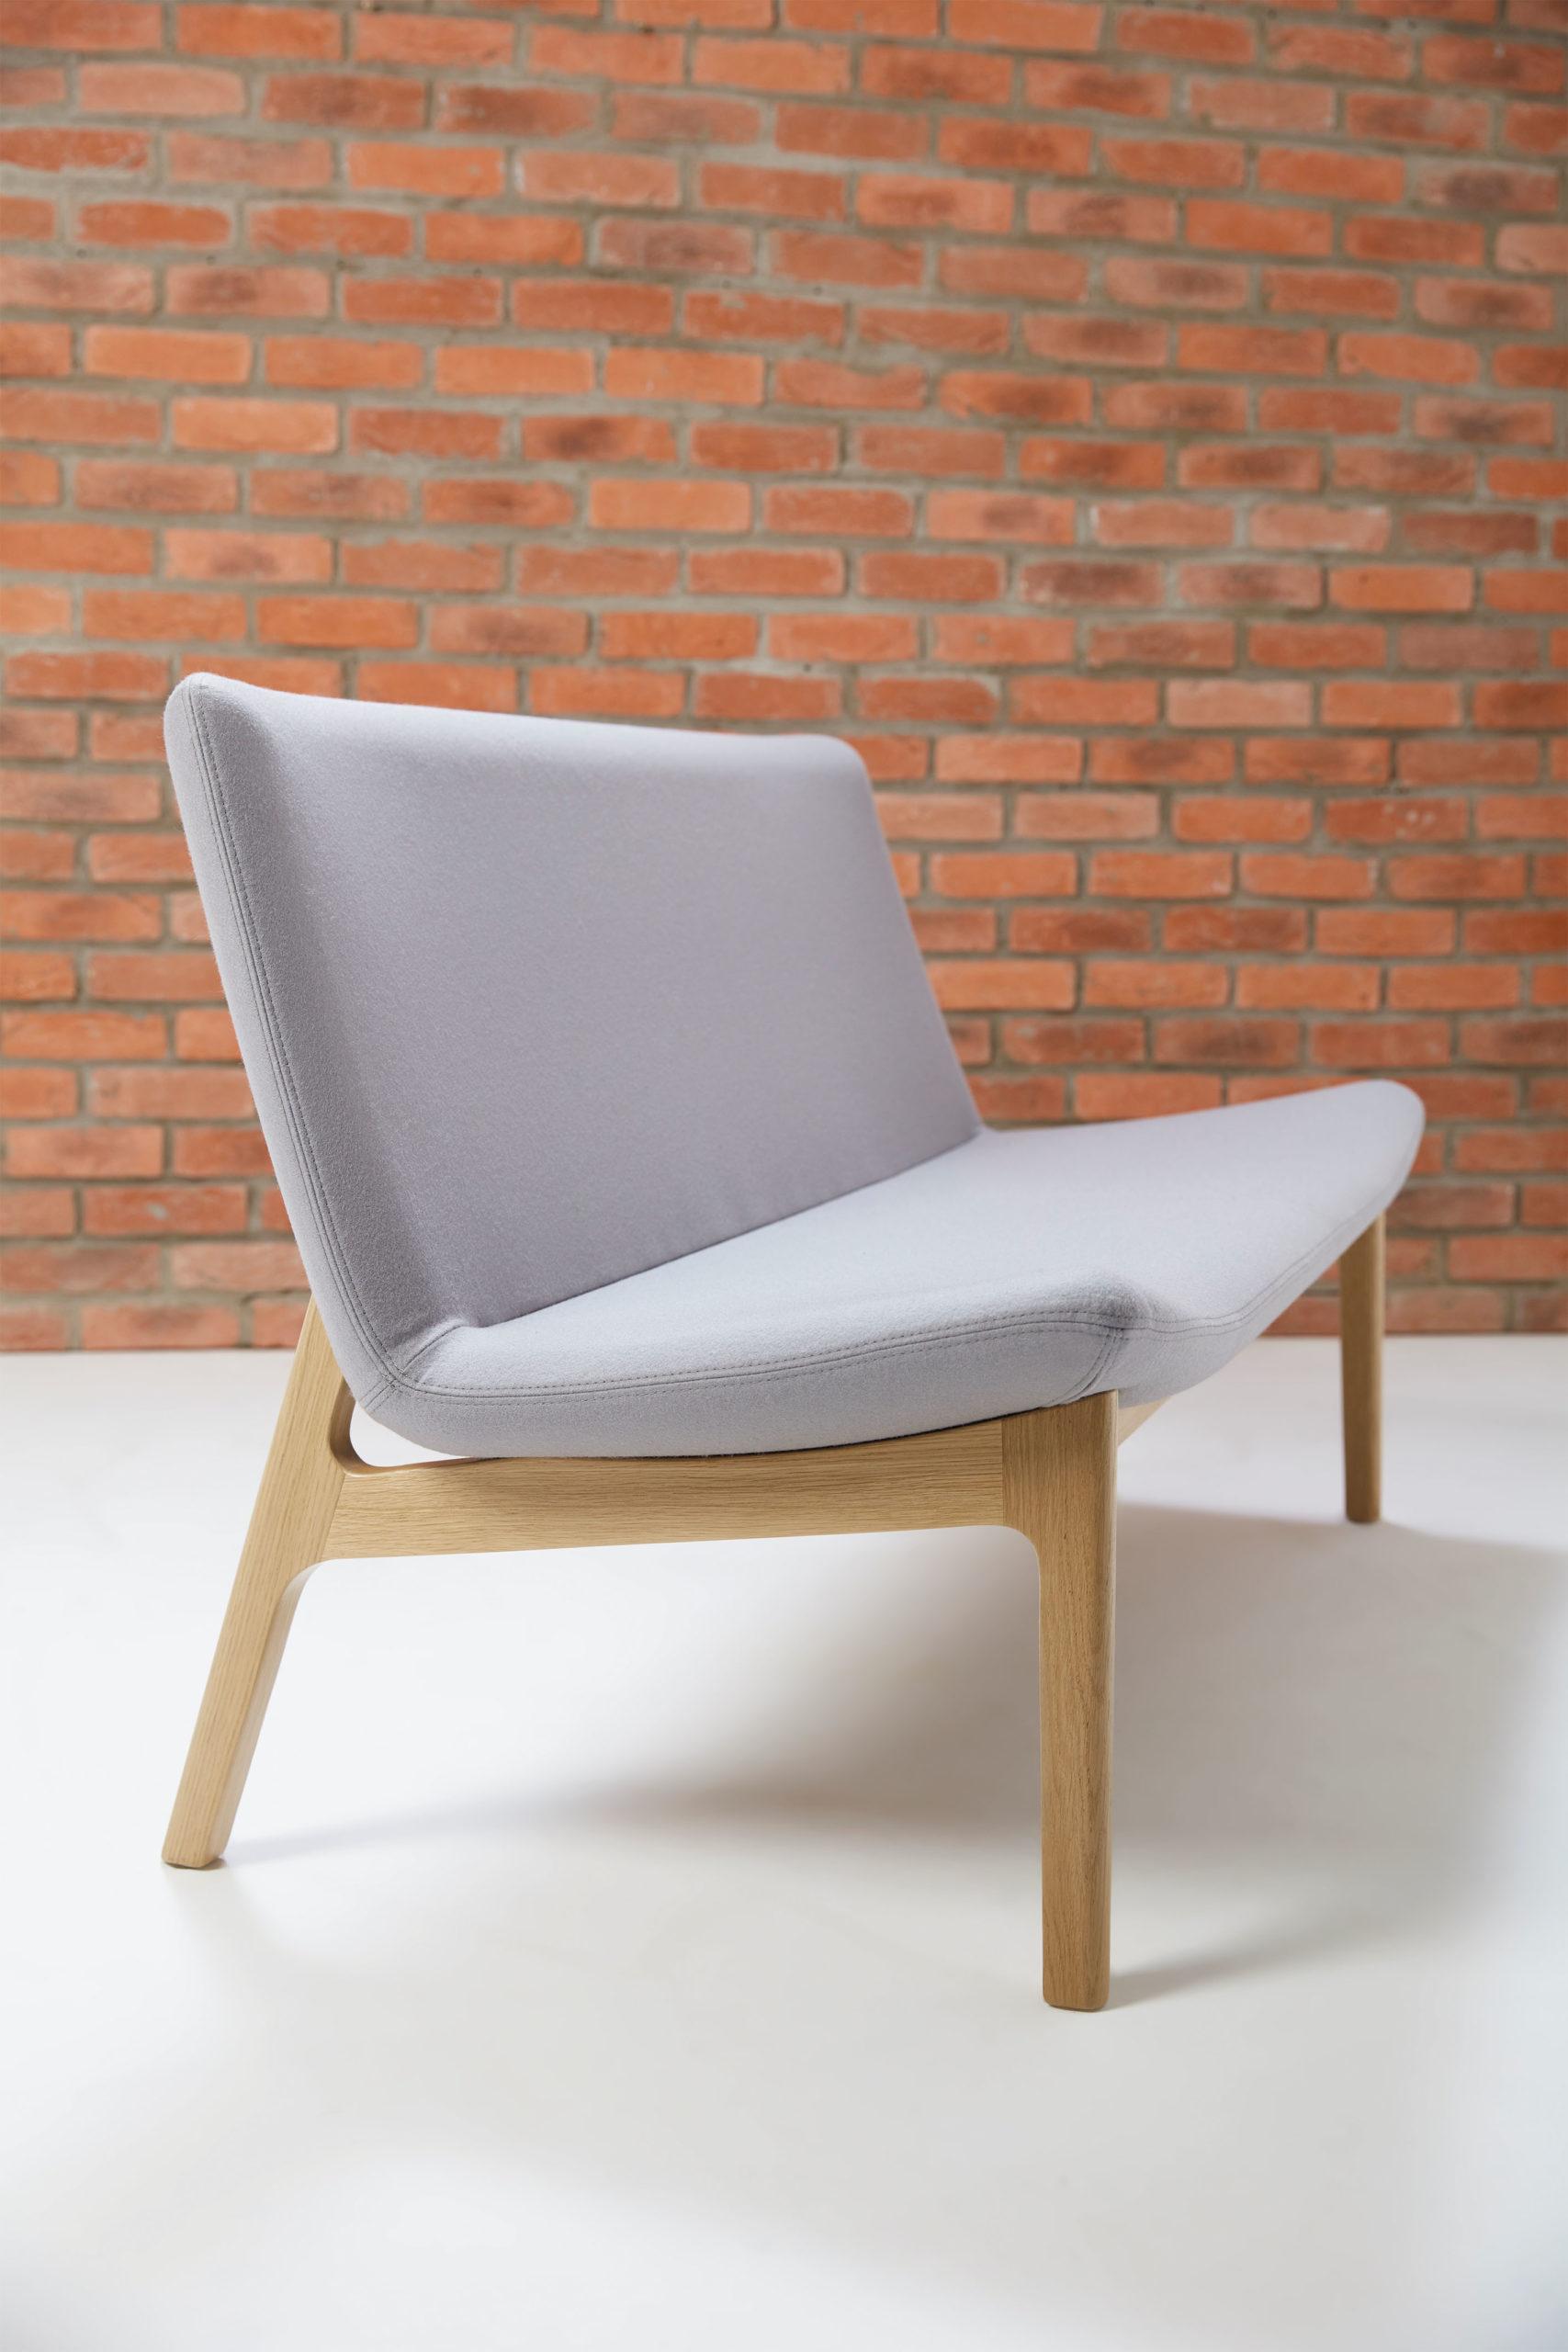 Connection Swoosh sofa's Project Meubilair